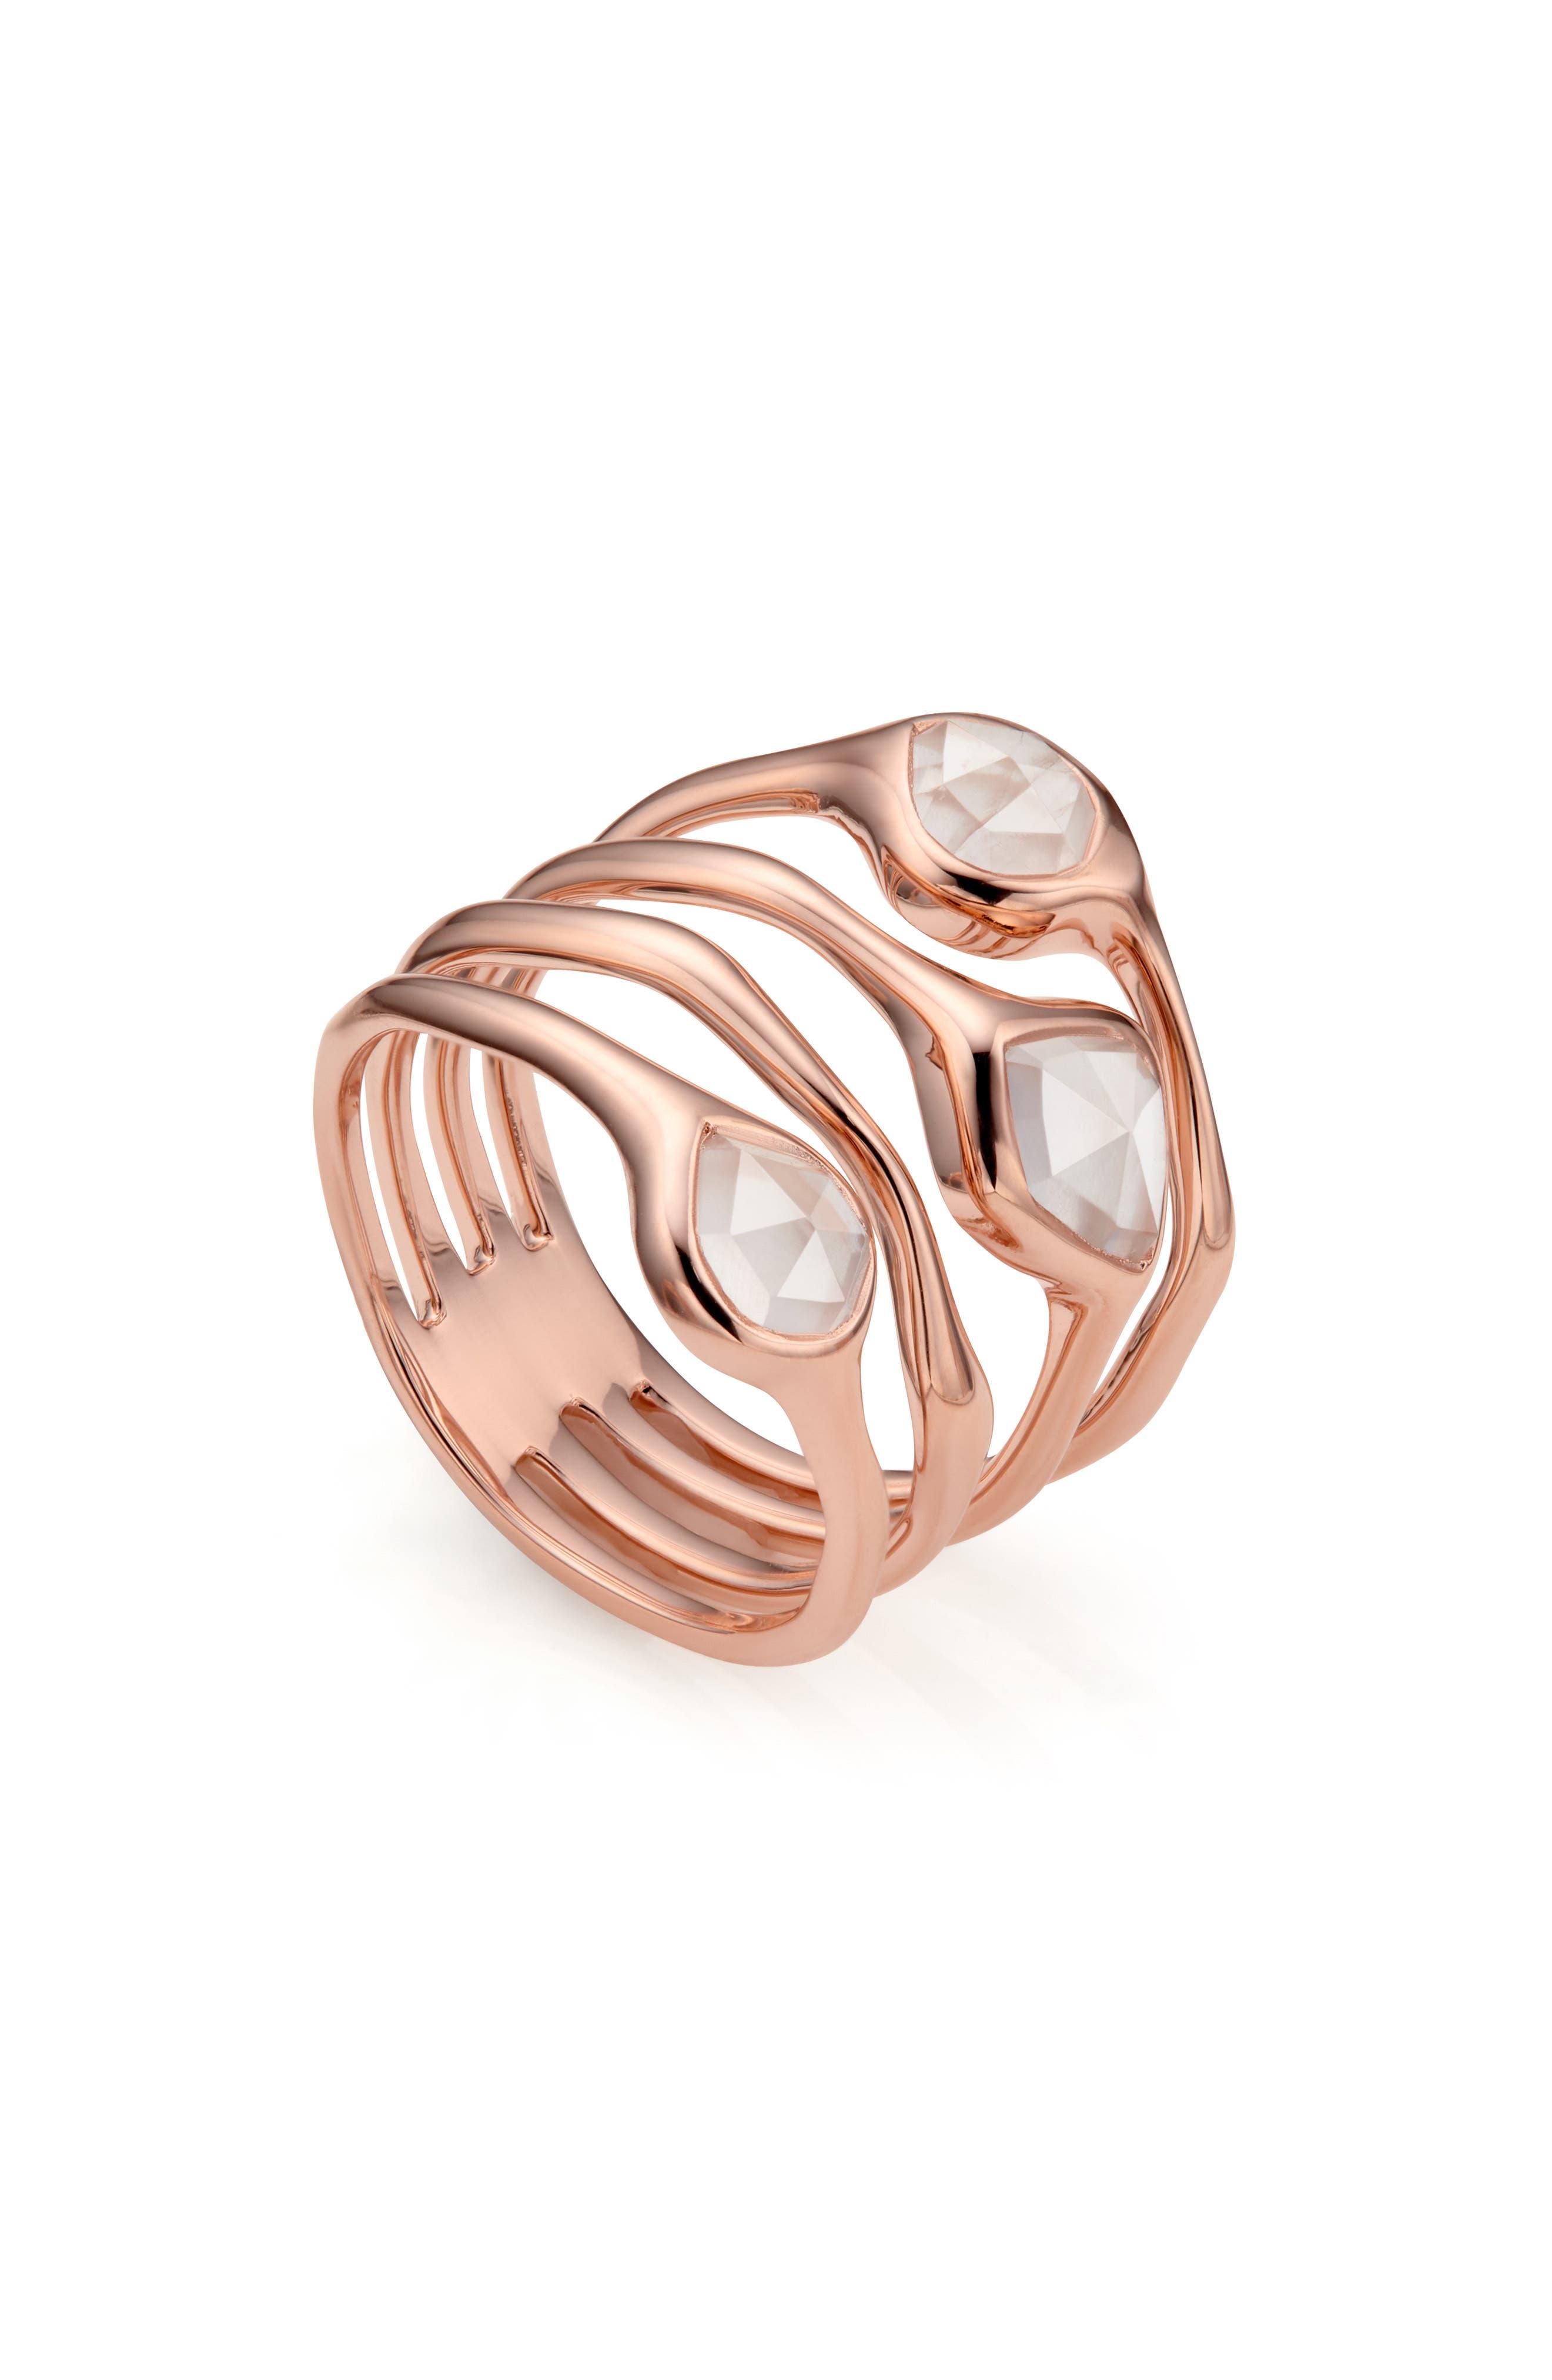 MONICA VINADER, Siren Cluster Cocktail Ring, Alternate thumbnail 3, color, ROSE GOLD/ ROSE QUARTZ